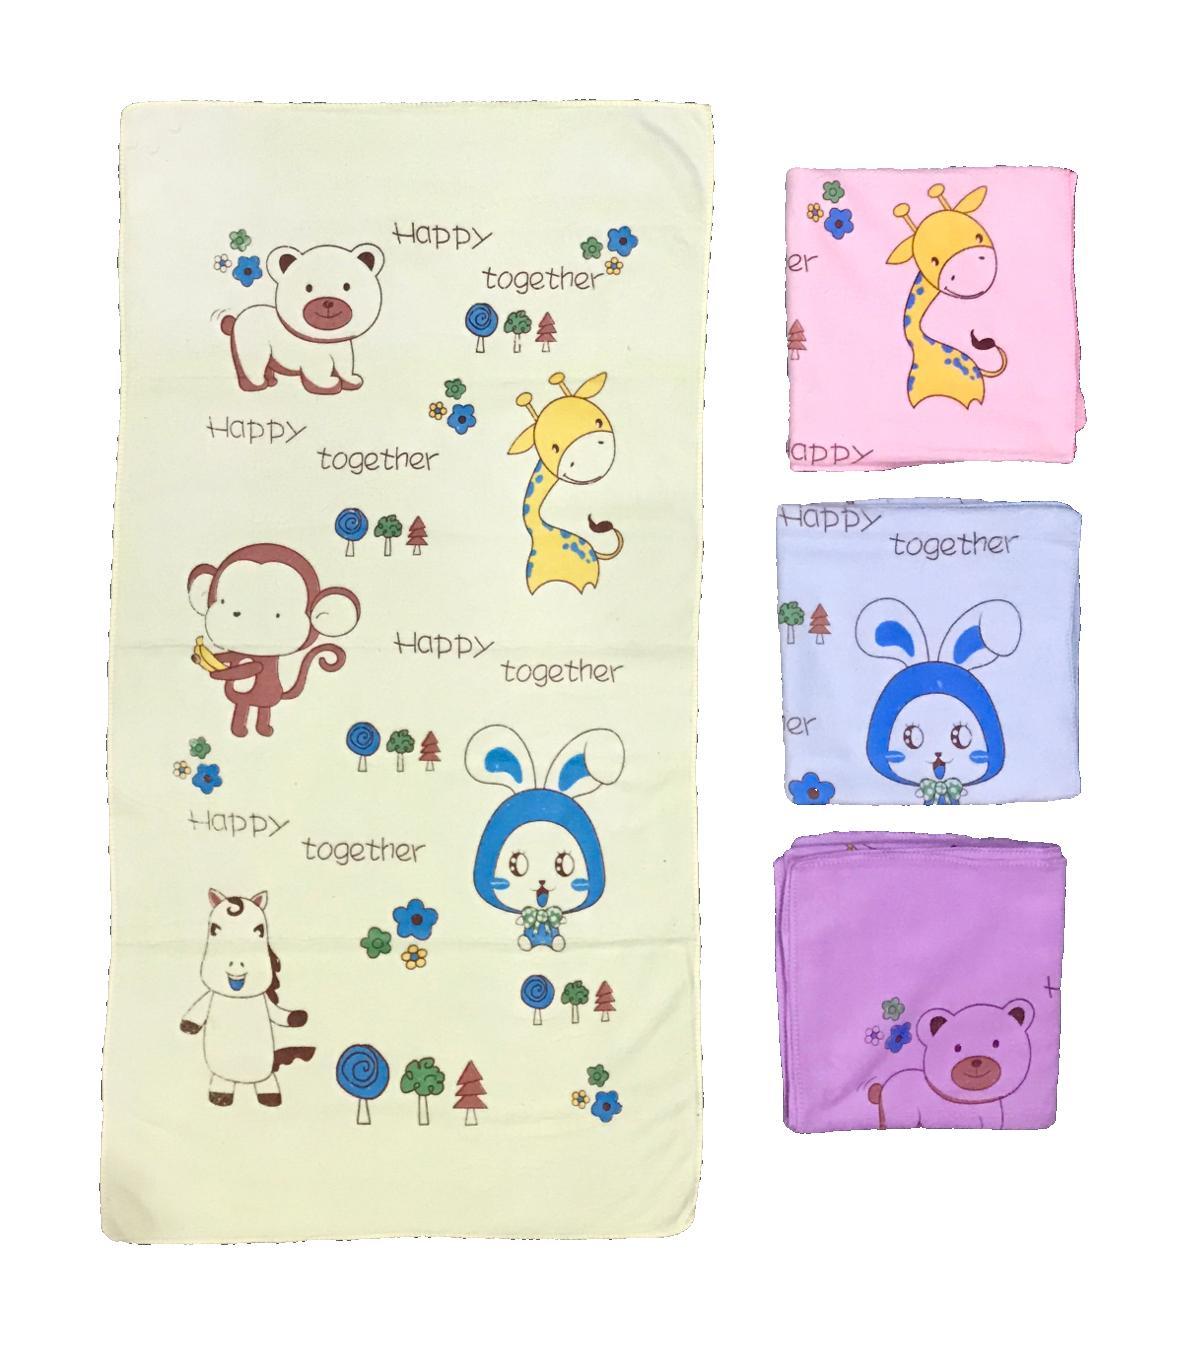 Bayie - Handuk Bayi Dan Anak Ukuran 100 X 50 Cm Motif Lucu Premium Quality/baby Towel/handuk Mandi Bayi By Bayie.